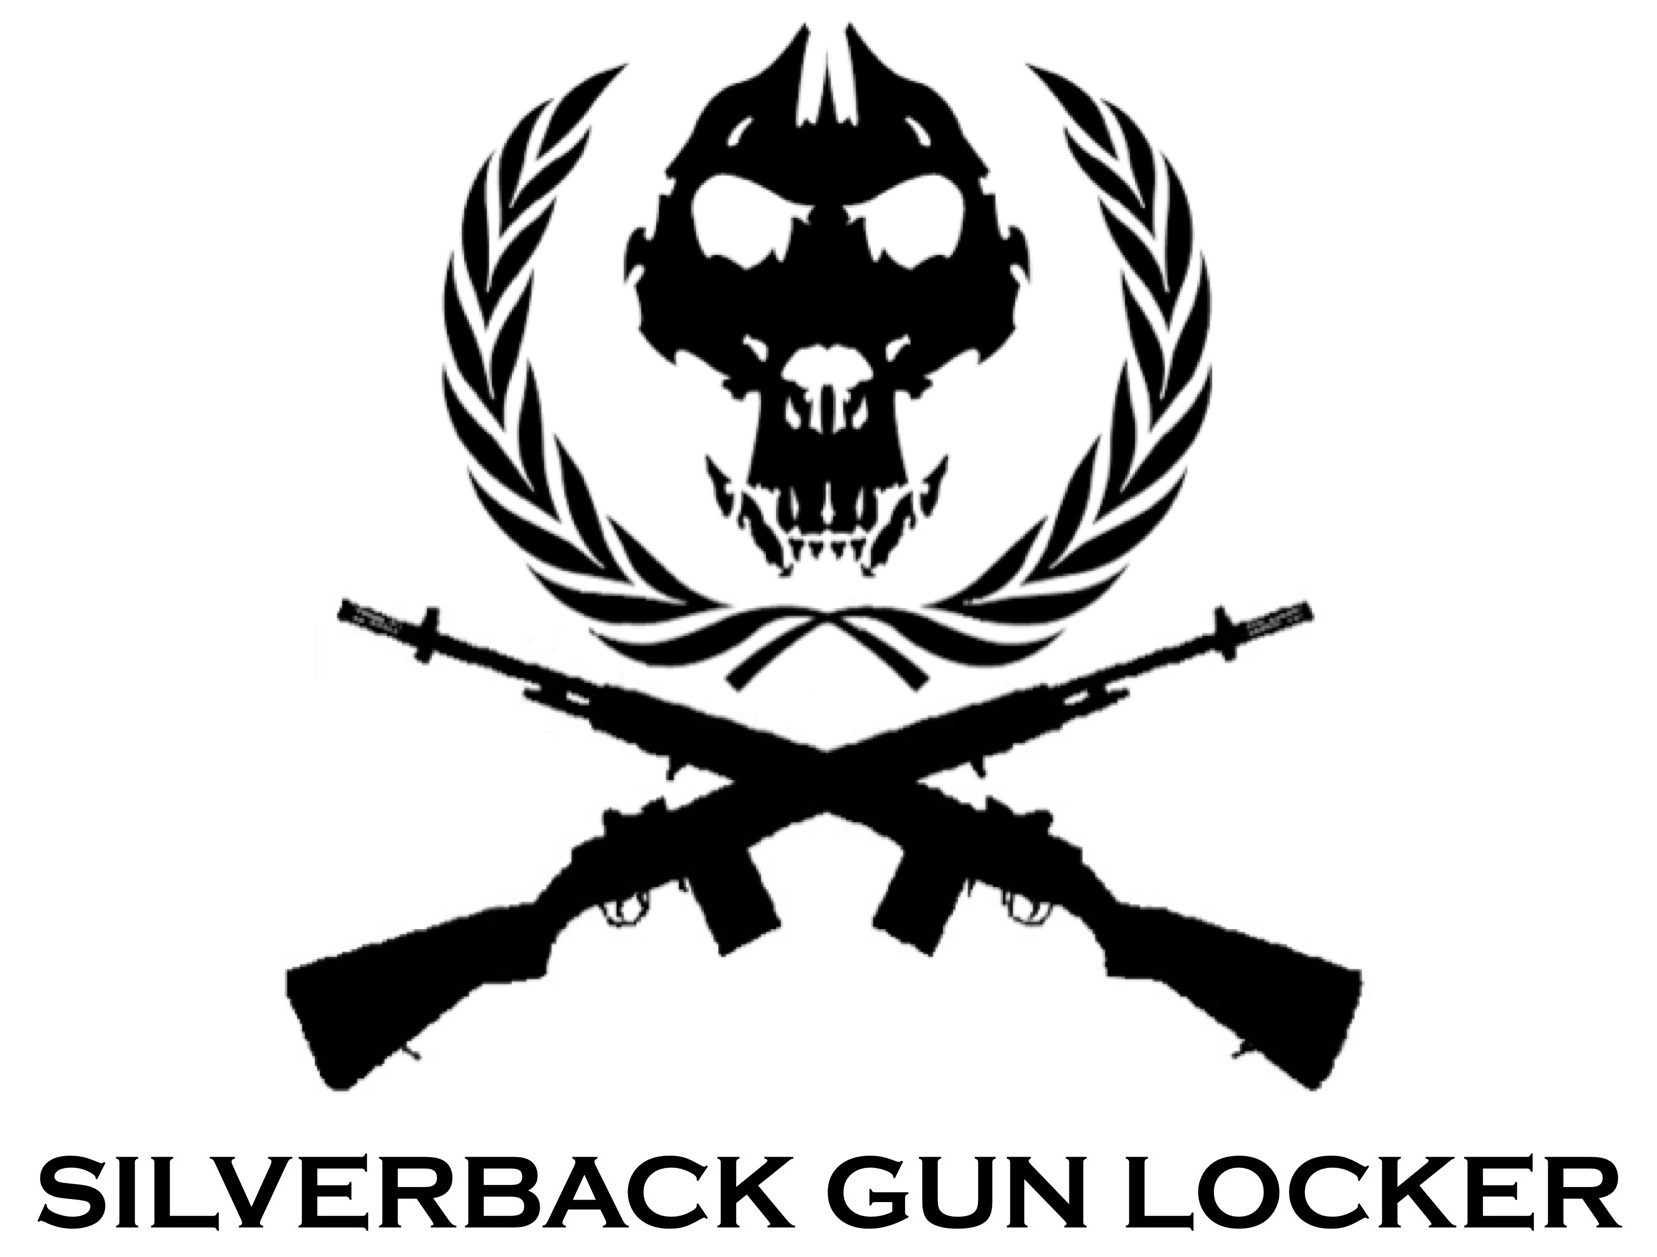 Firearms Firearms For Sale Guns Guns For Sale Gear